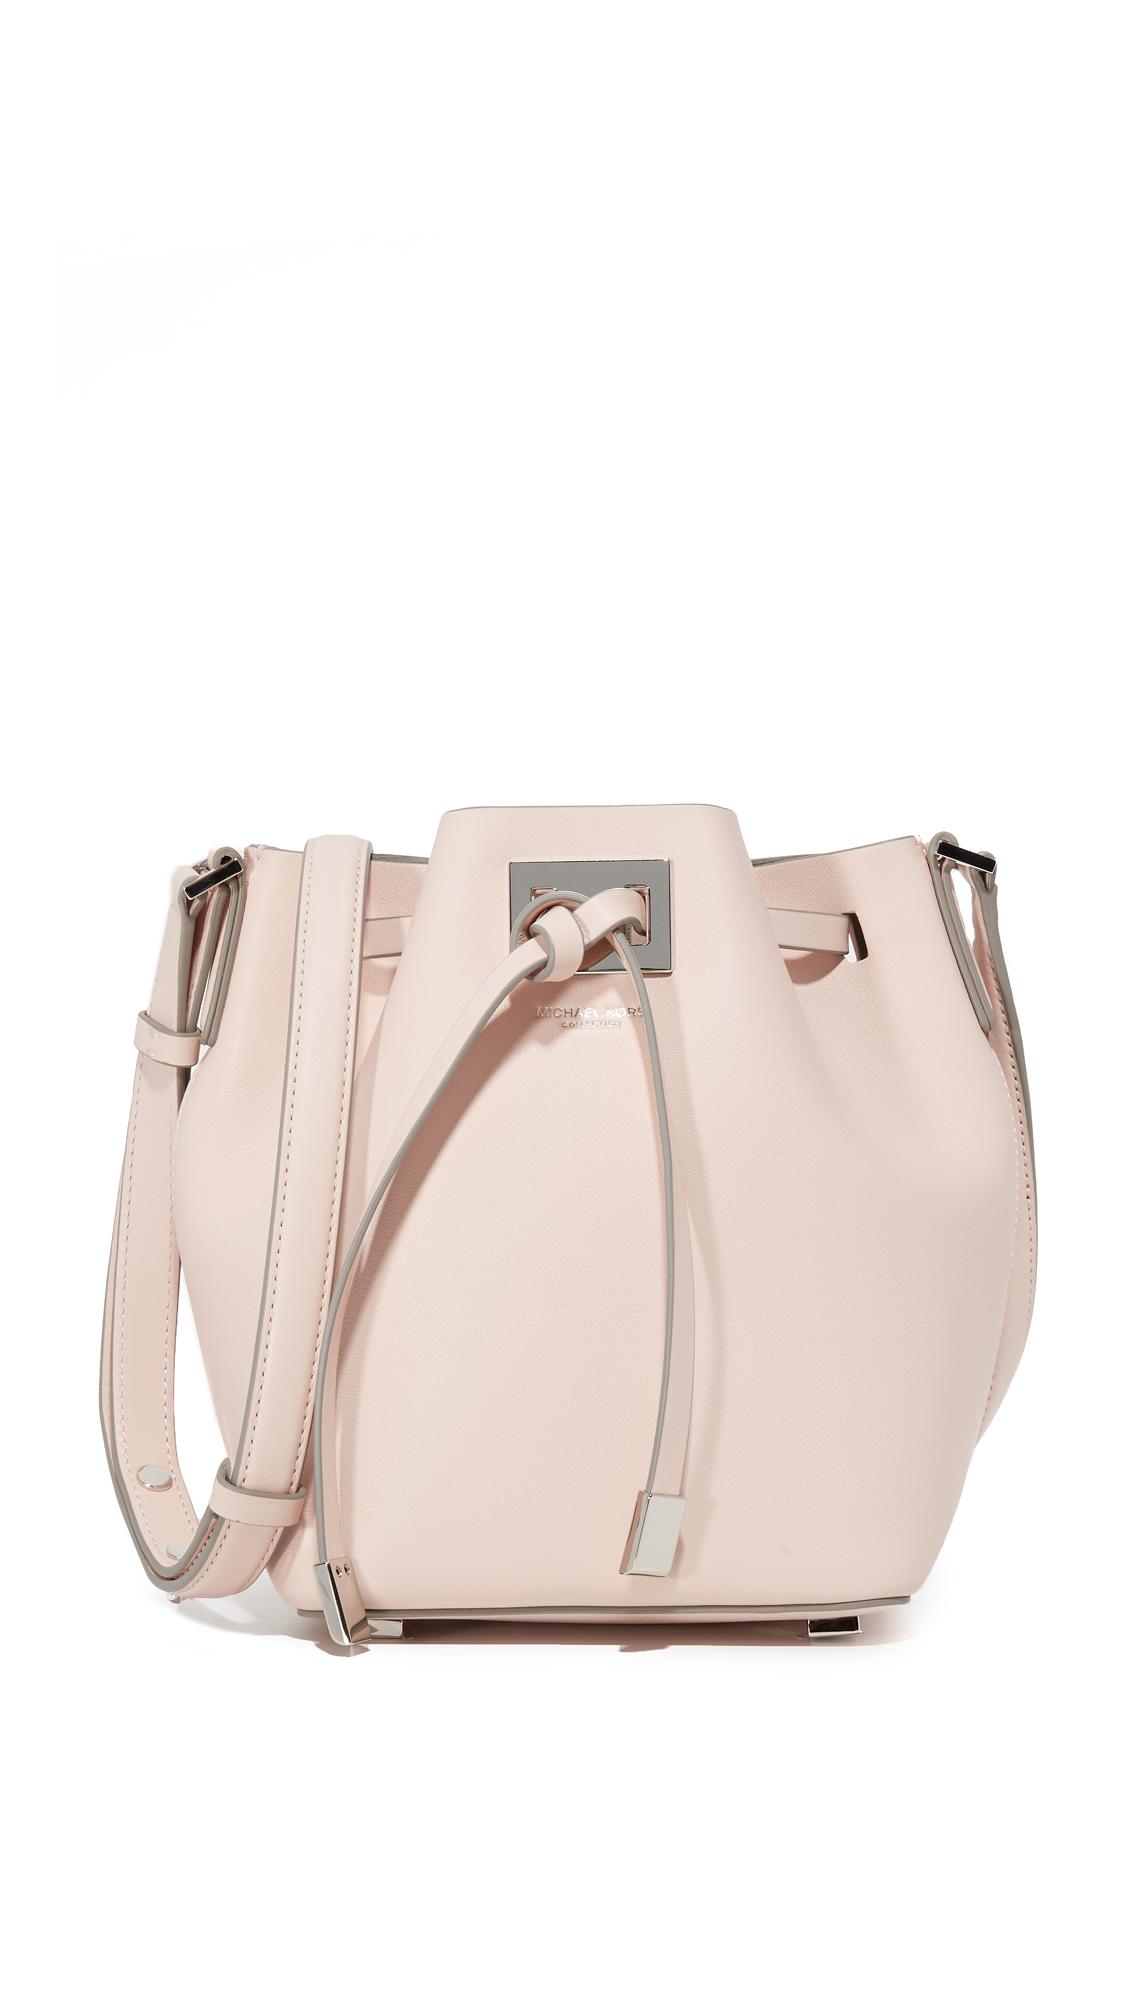 74558c9928d2d4 Gallery. Previously sold at: Shopbop · Women's Bucket Bags Women's Michael  By Michael Kors Miranda